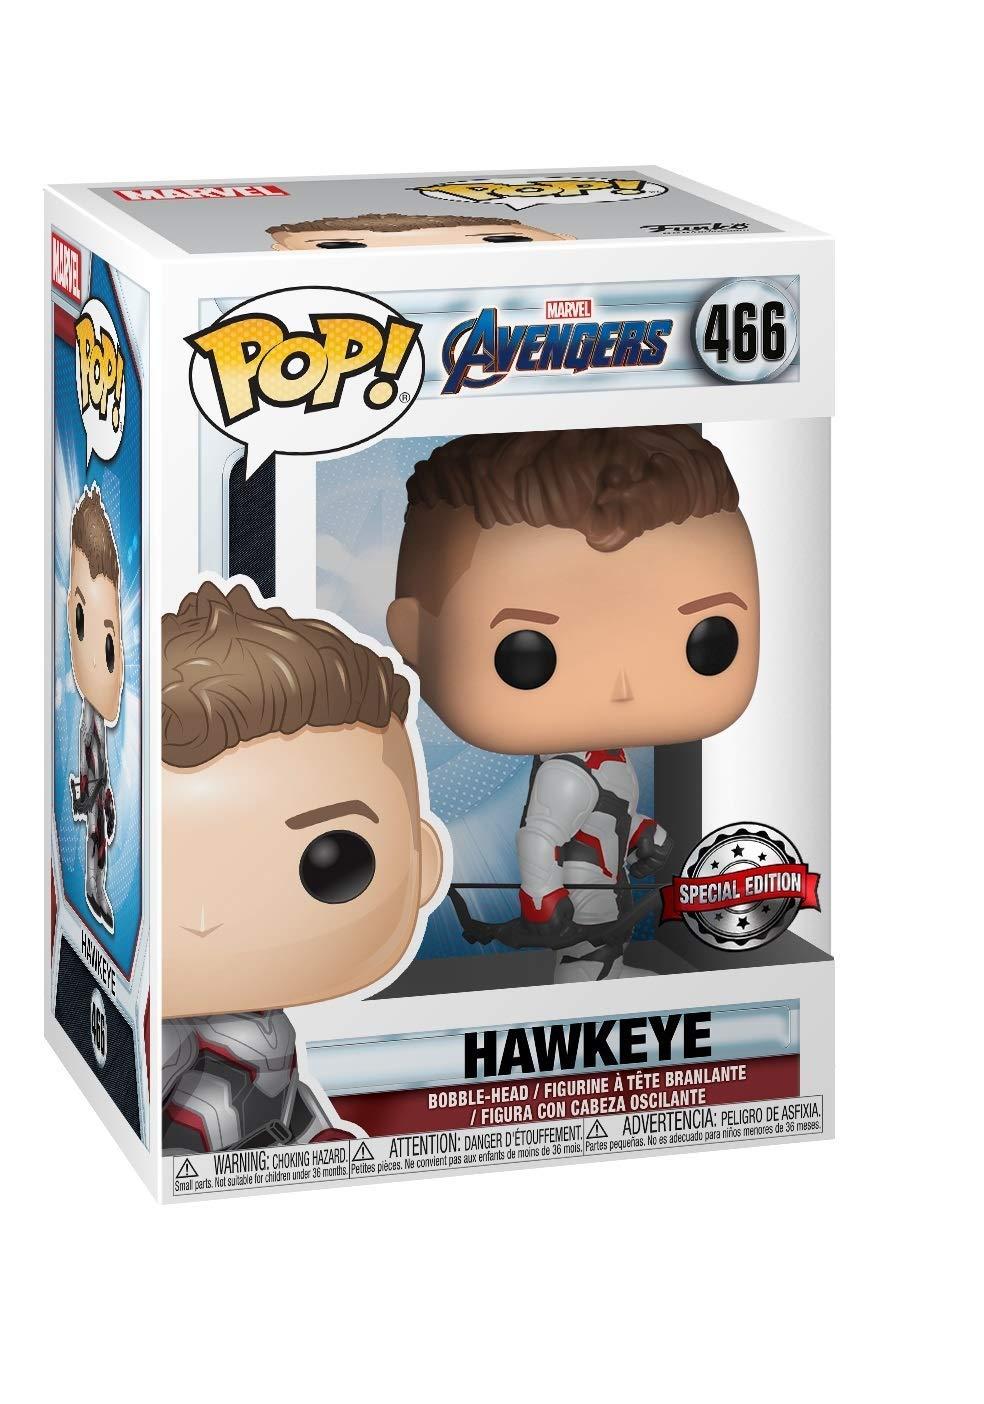 Funko Pop Avengers Endgame Hawkeye Exclusive Vinyl Figure